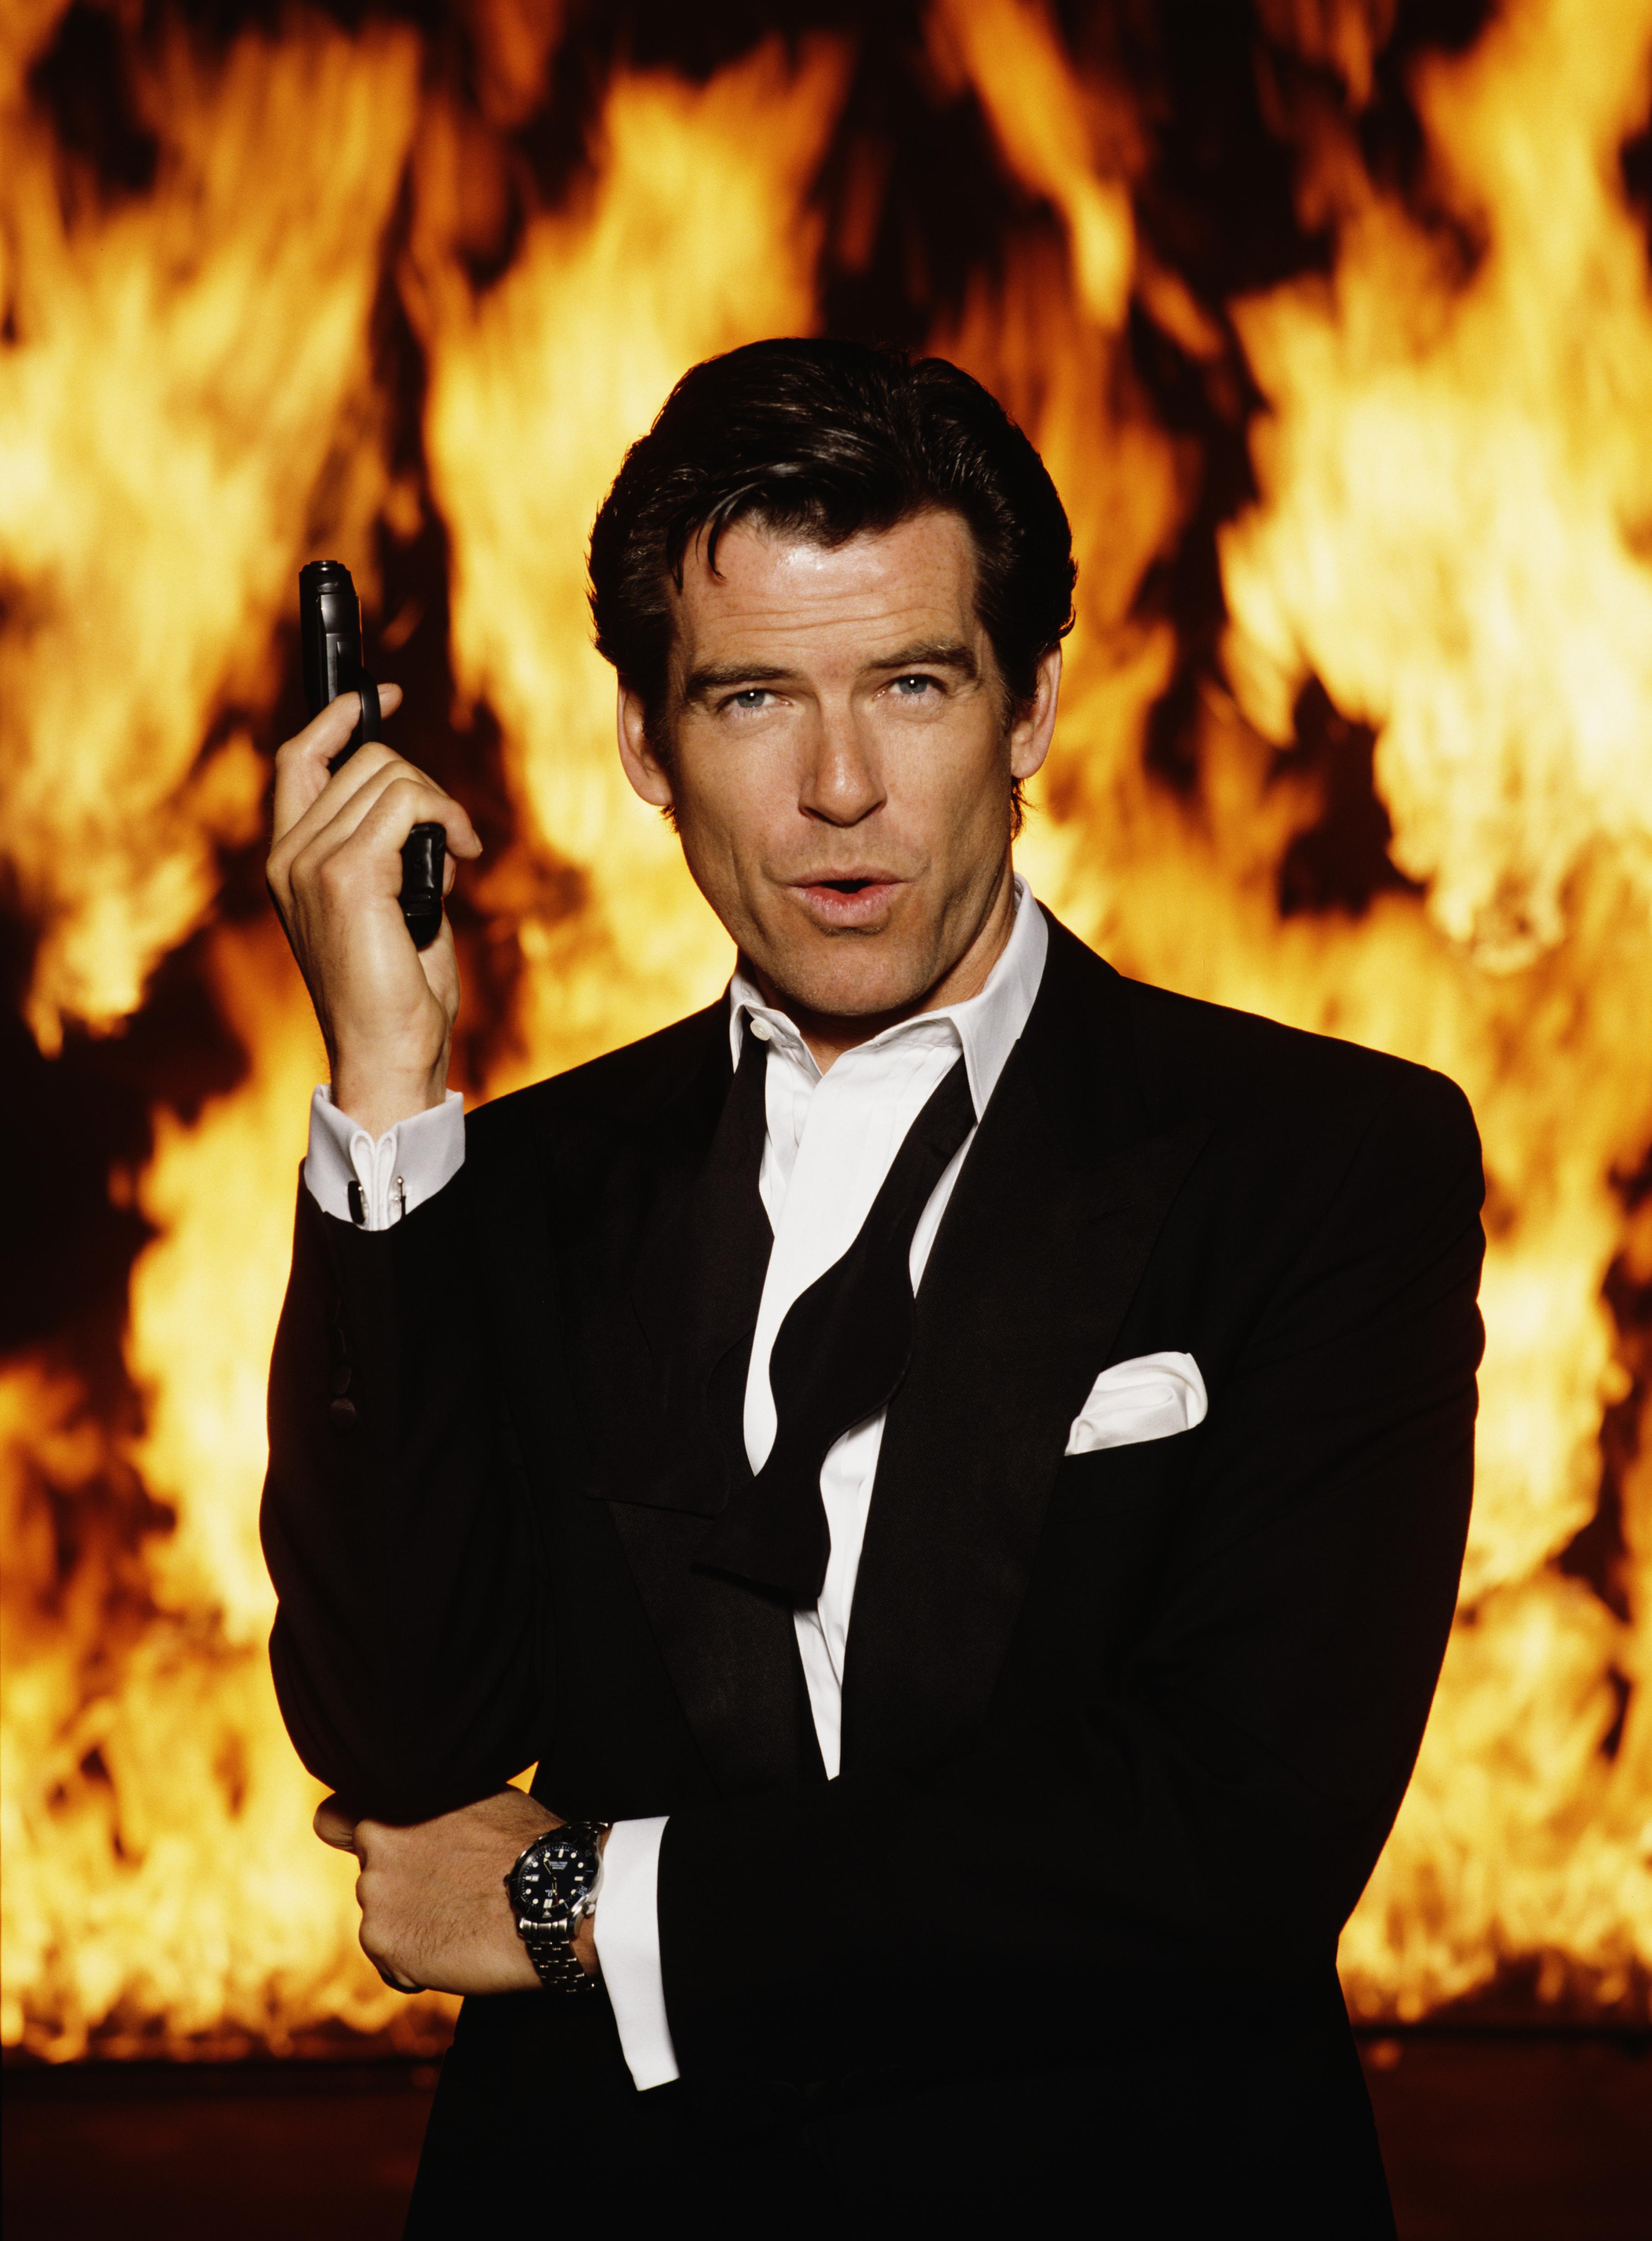 James Bond Anwärter